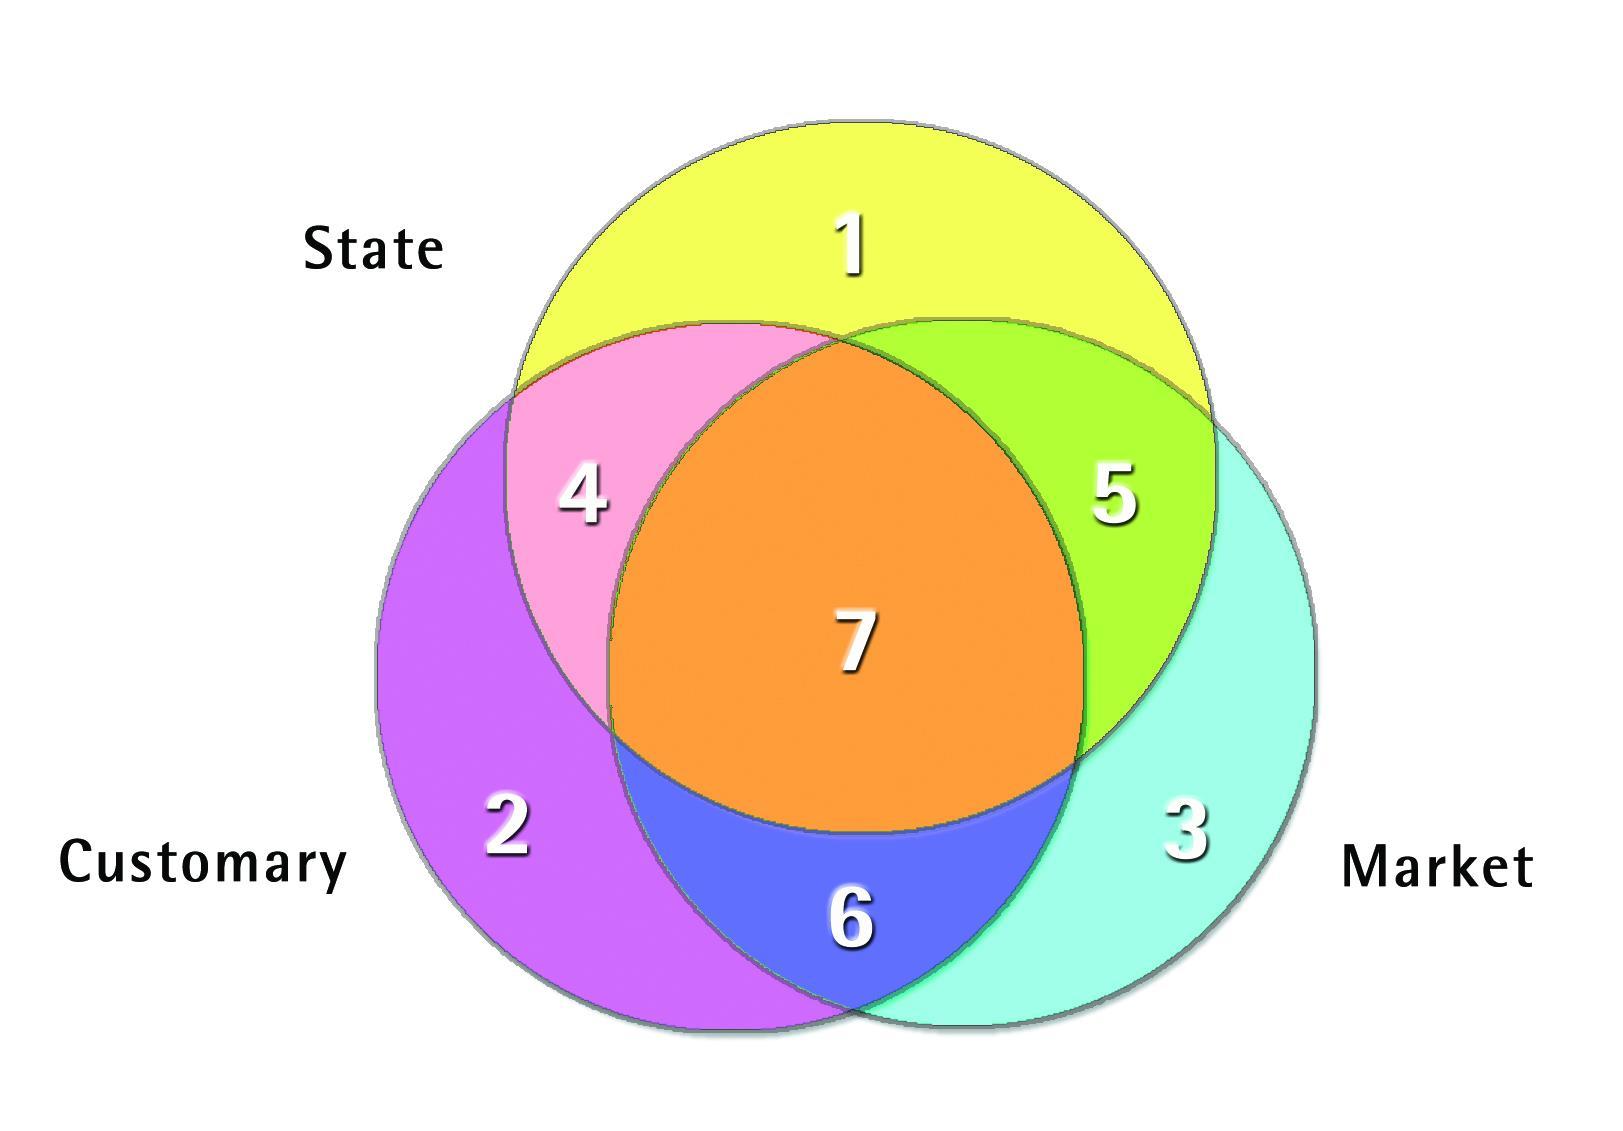 Altman 2014 figure 14 - The hybrid economy model